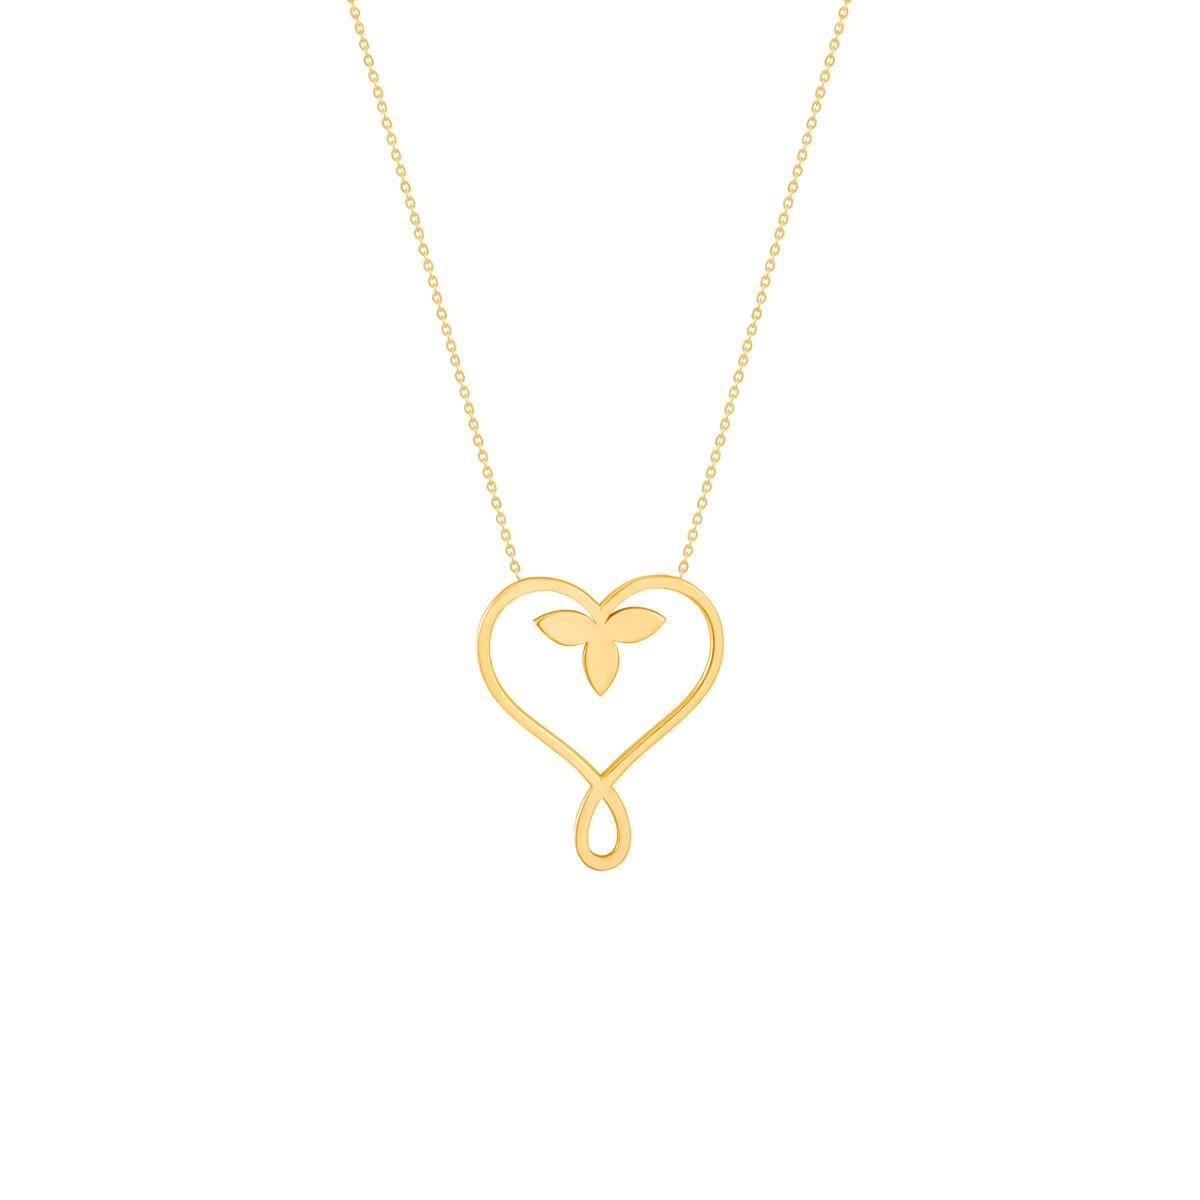 گردنبند طلا قلب و برگ